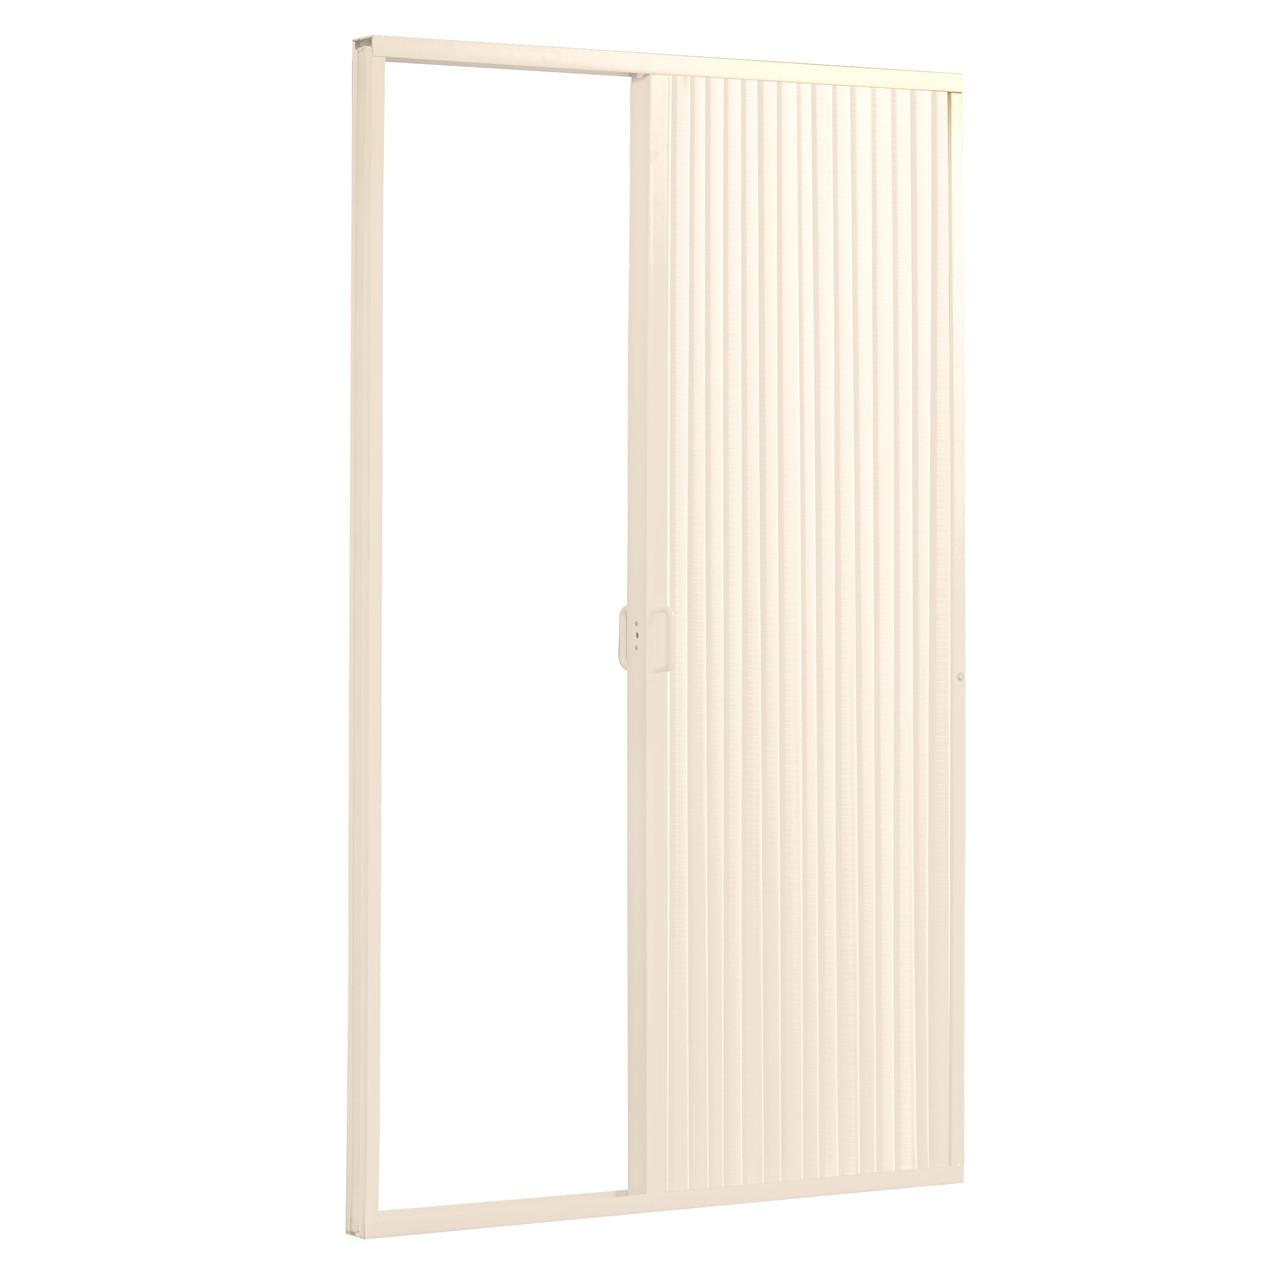 RV Shower Doors ...  sc 1 st  RecPro & Pleated Folding RV Shower Doors Ivory - RecPro